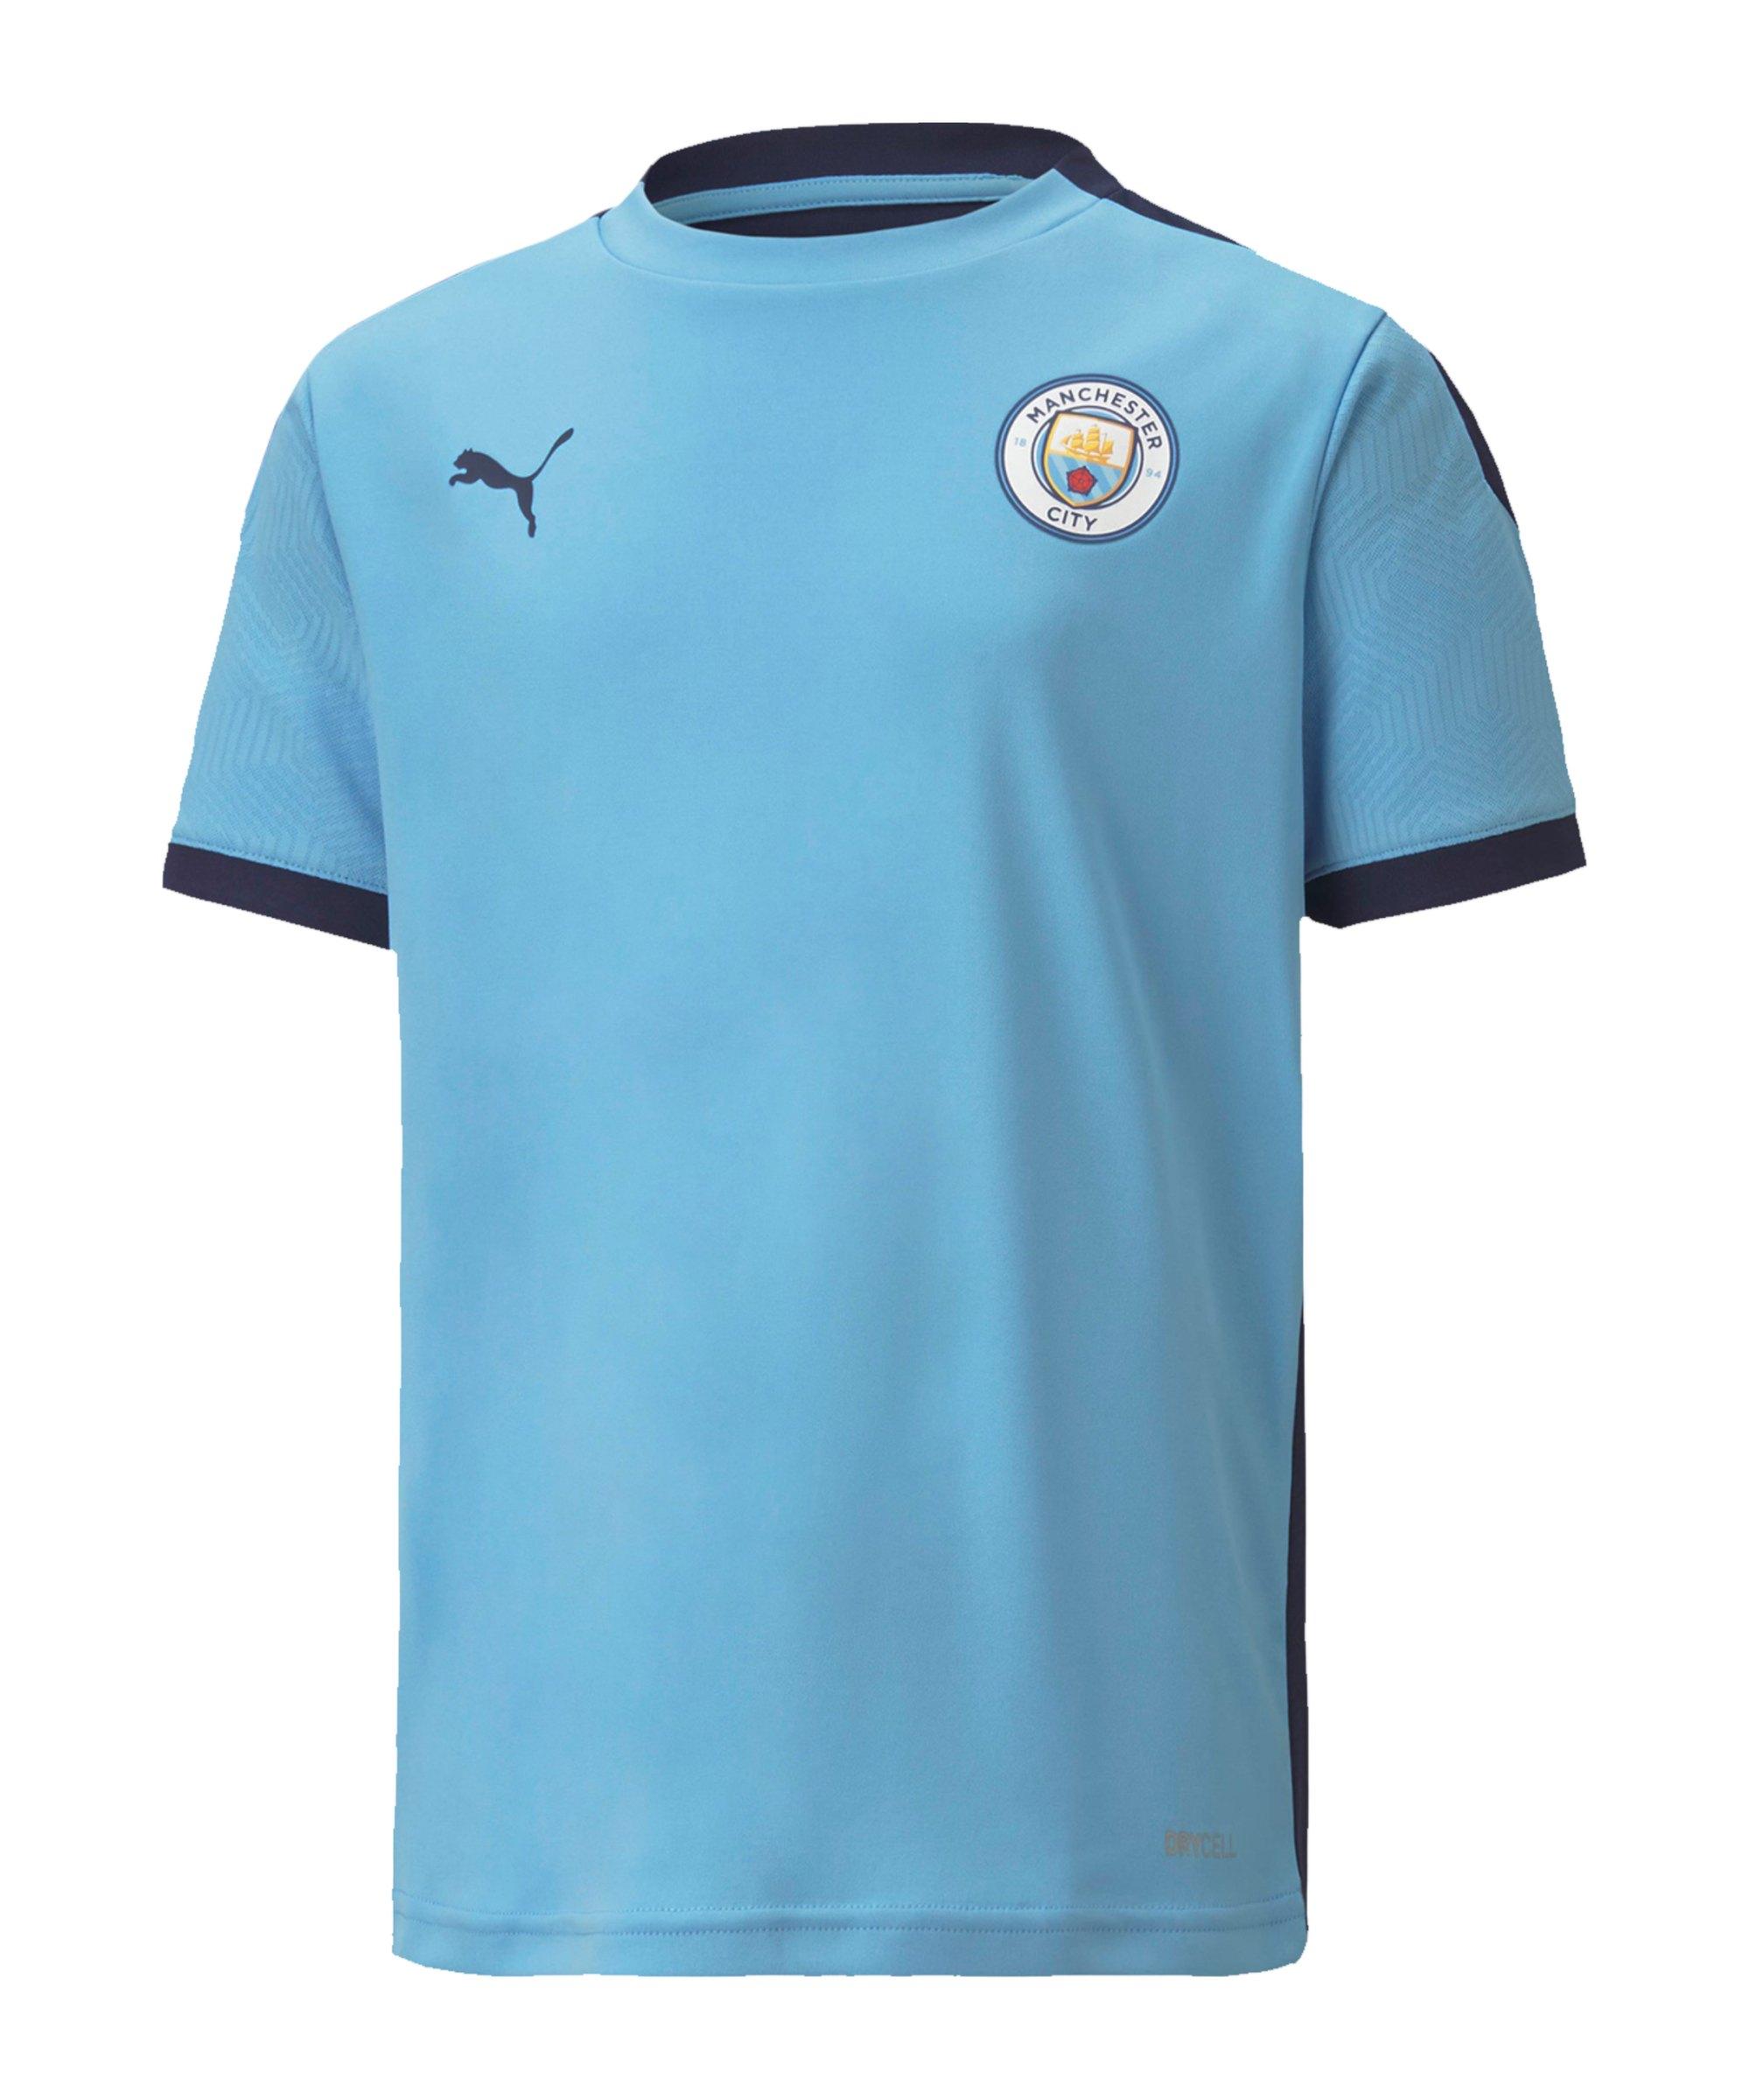 PUMA Manchester City Trainingstrikot Kids Blau F01 - blau